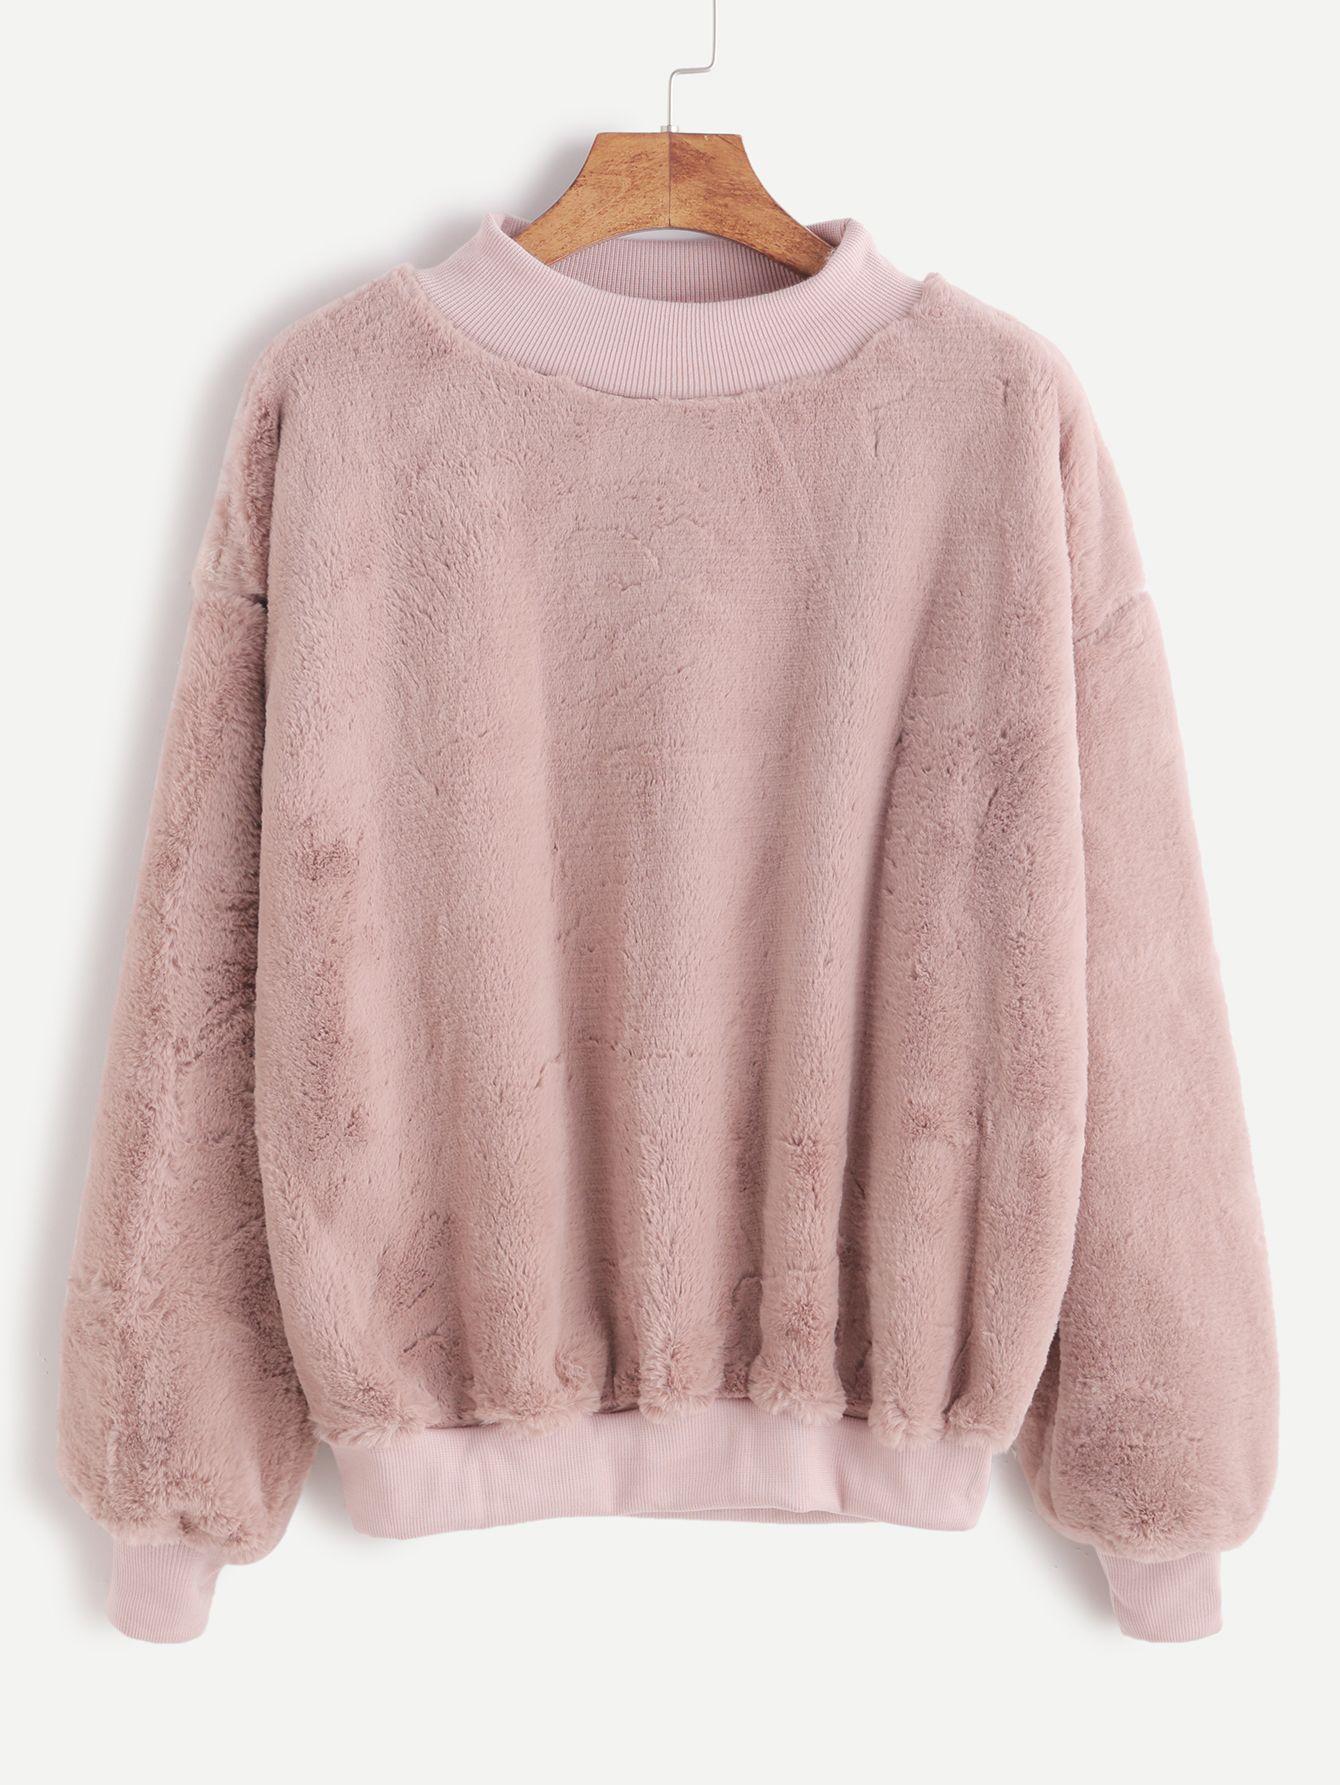 659fb76cc2 Shop Contrast Ribbed Trim Drop Shoulder Fluffy Sweatshirt online ...